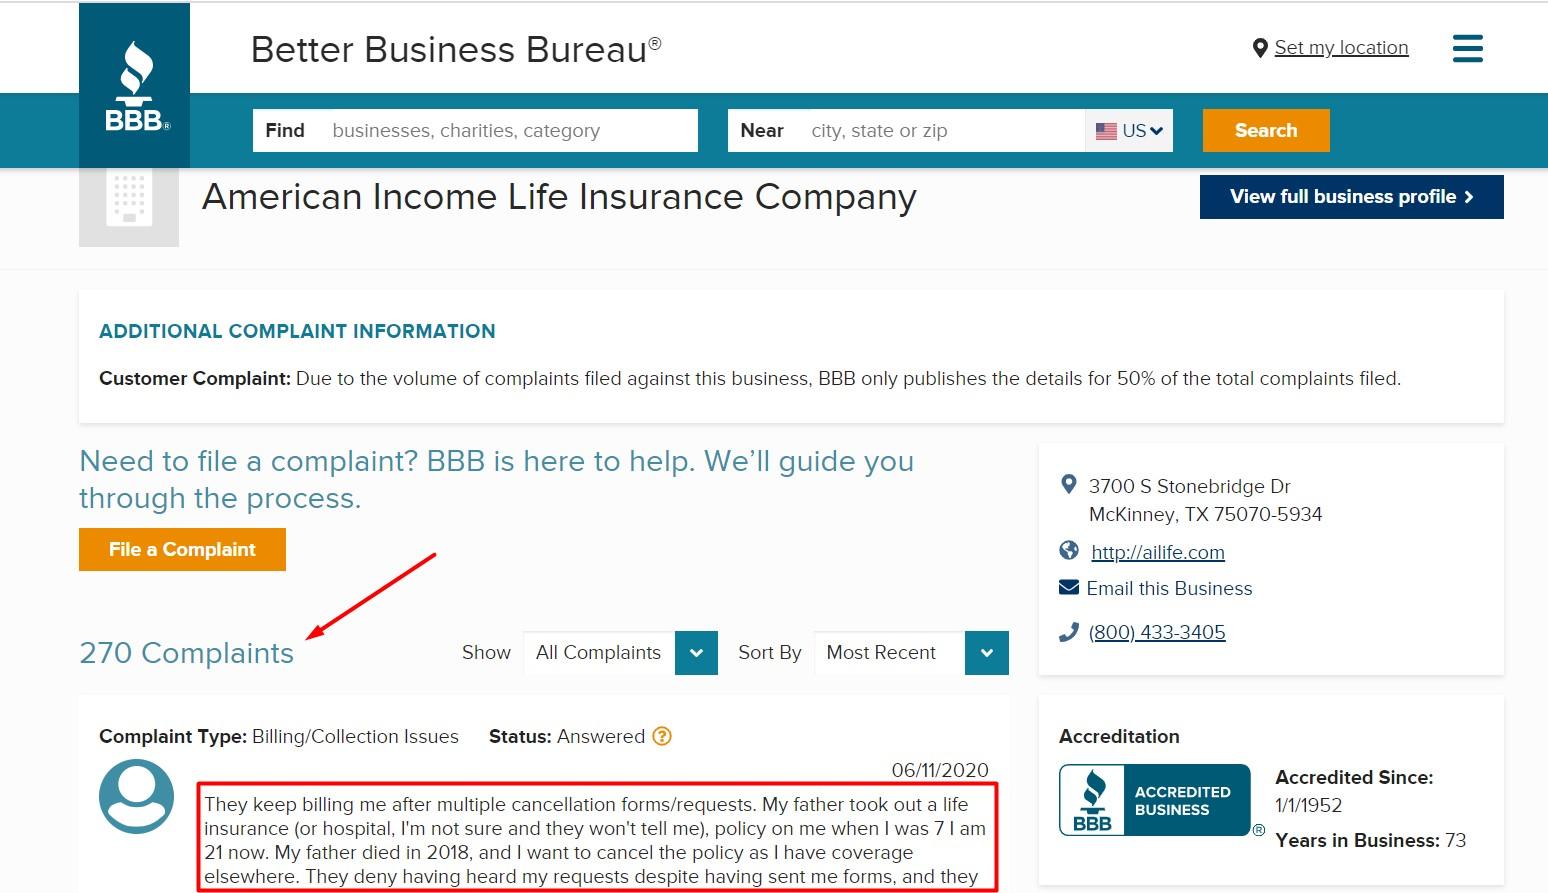 American Income Life Insurance scam